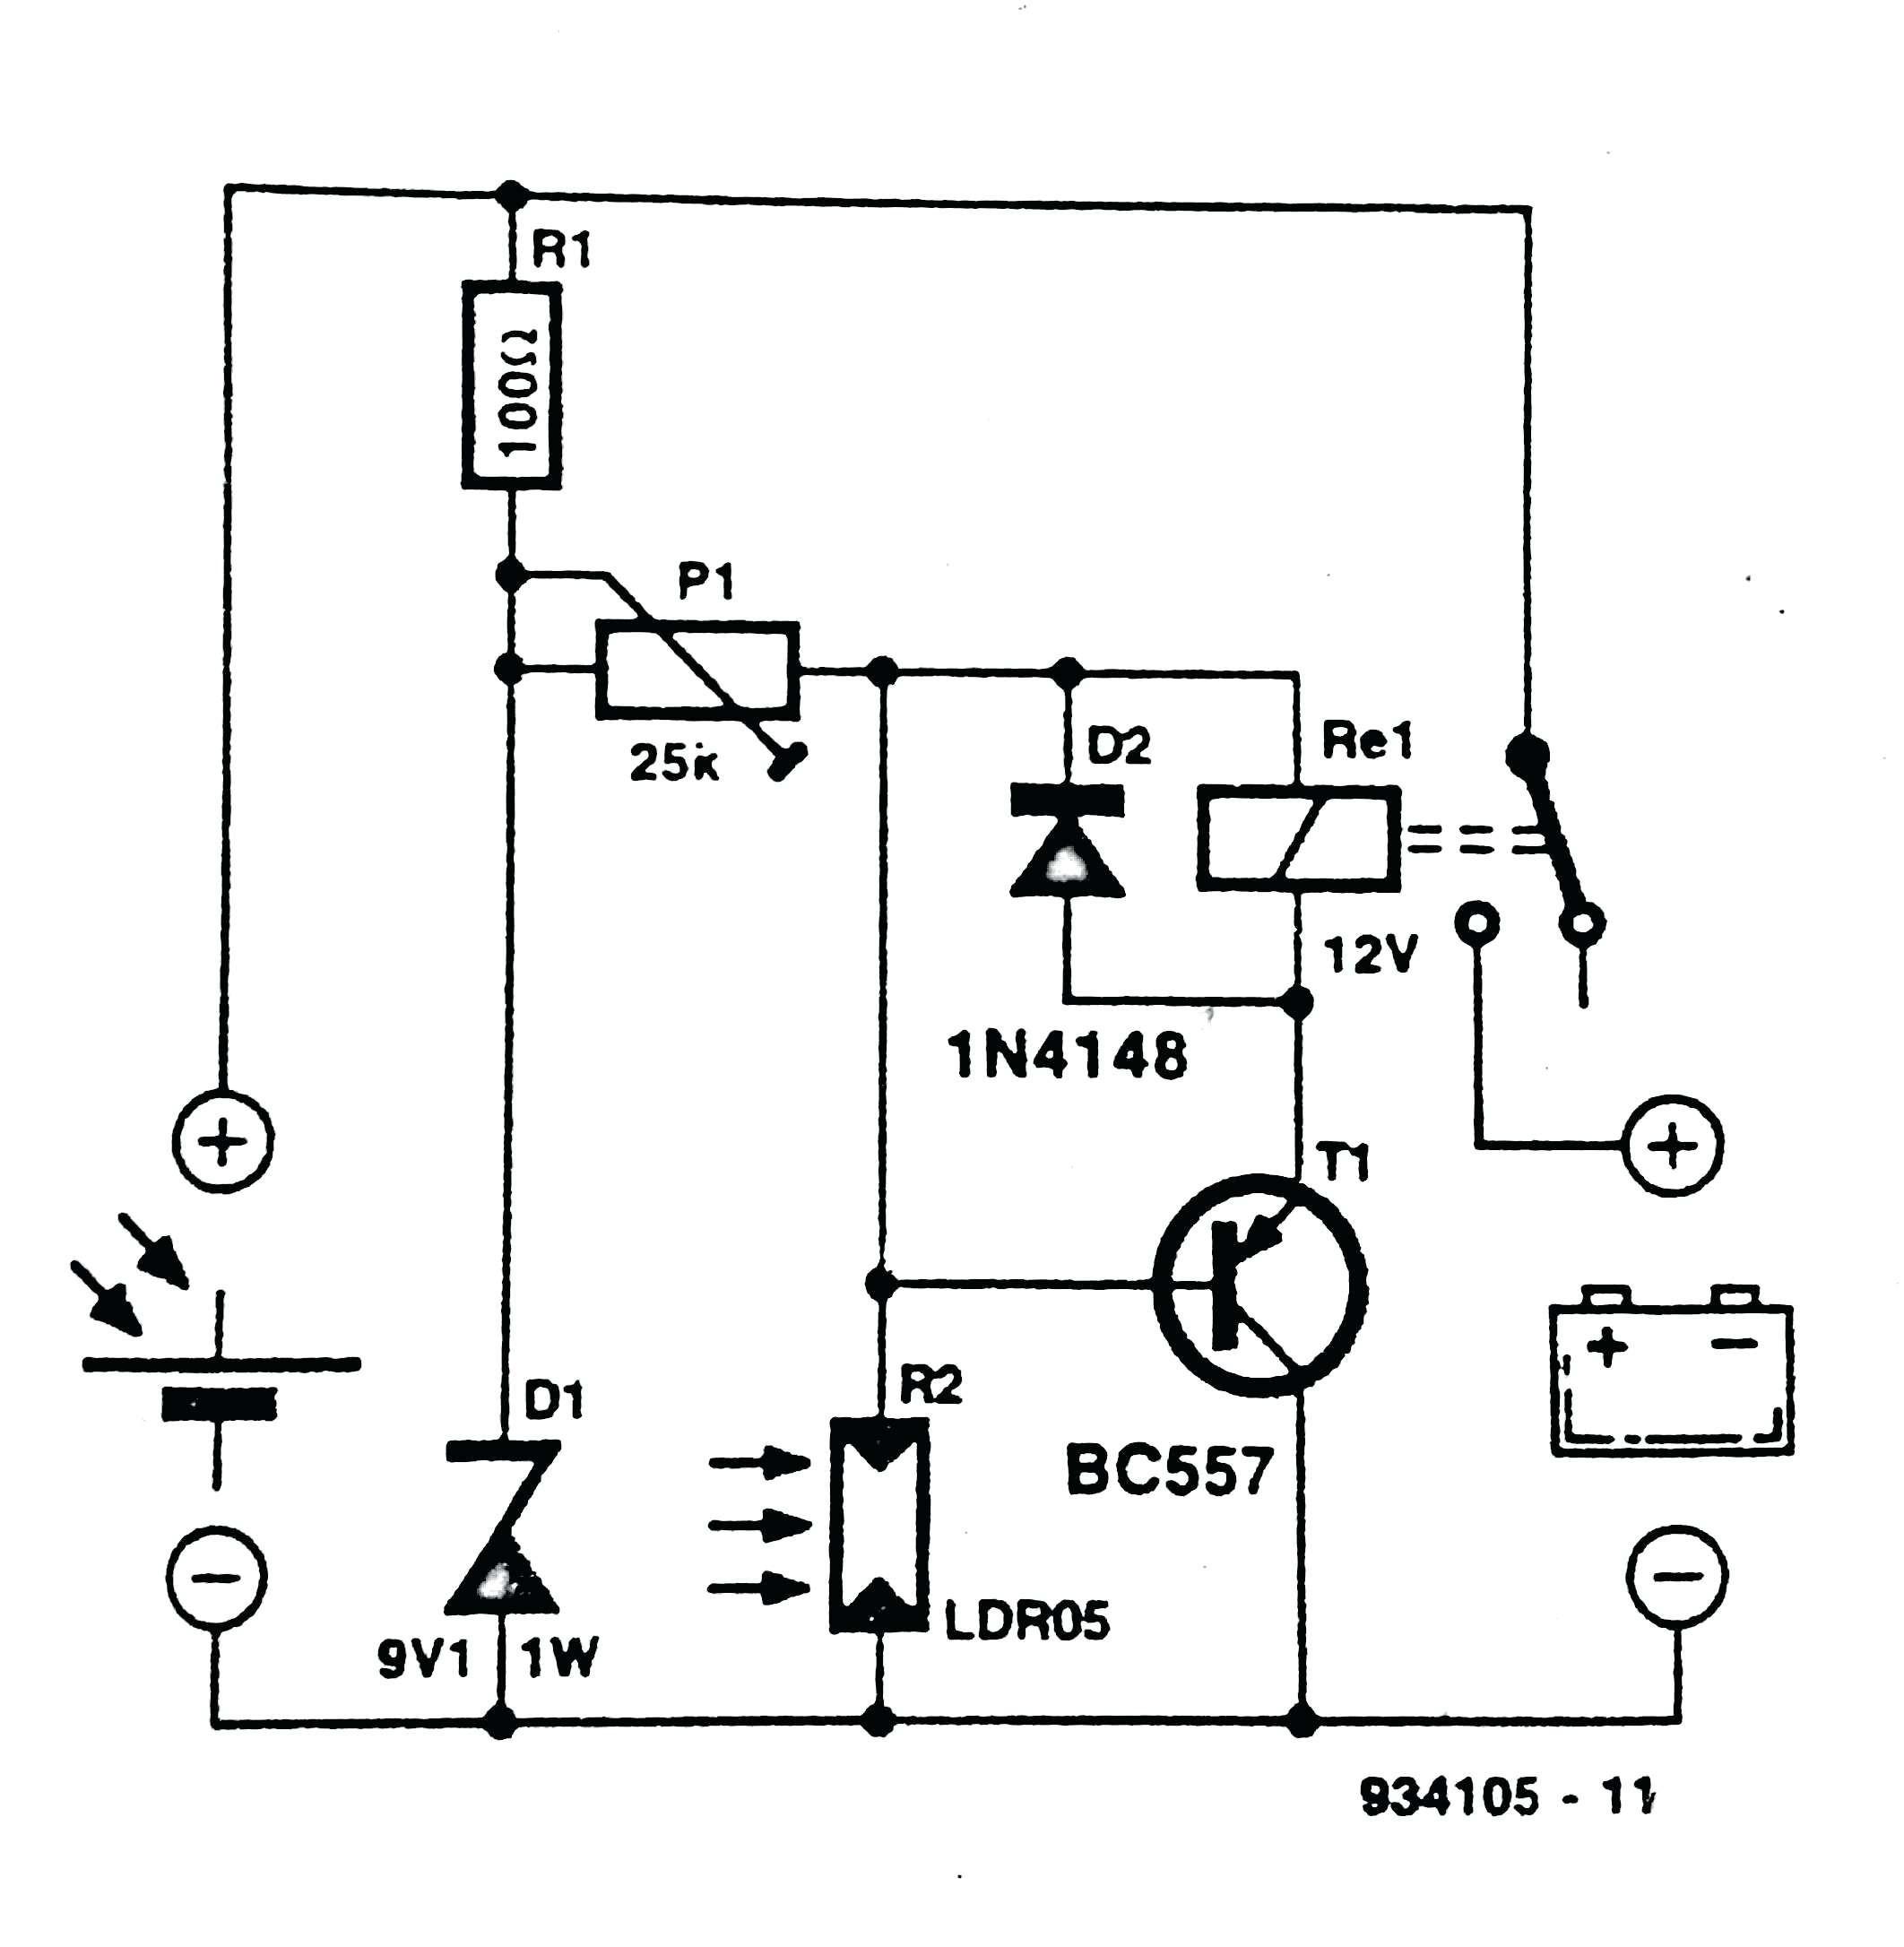 1995 Ford Ranger Wiring Diagram Additionally Honda 125 Wiring Diagram